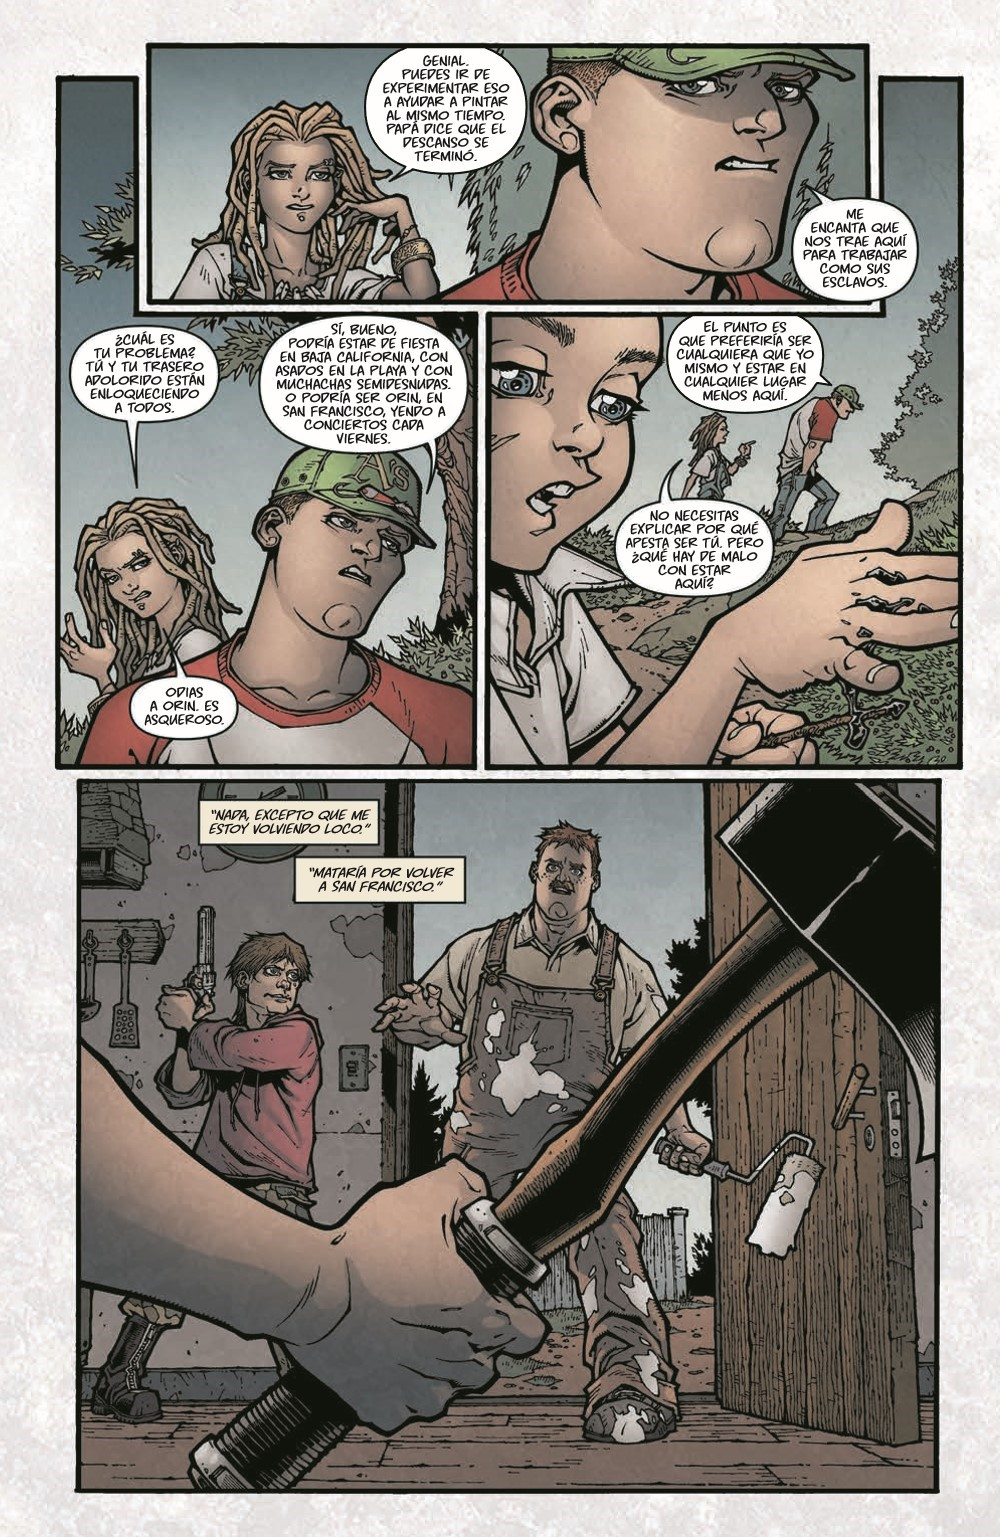 LockeandKey_TPB_pr-8 ComicList Previews: LOCKE AND KEY VOLUME 1 BIENVENIDOS A LOVECRAFT TP